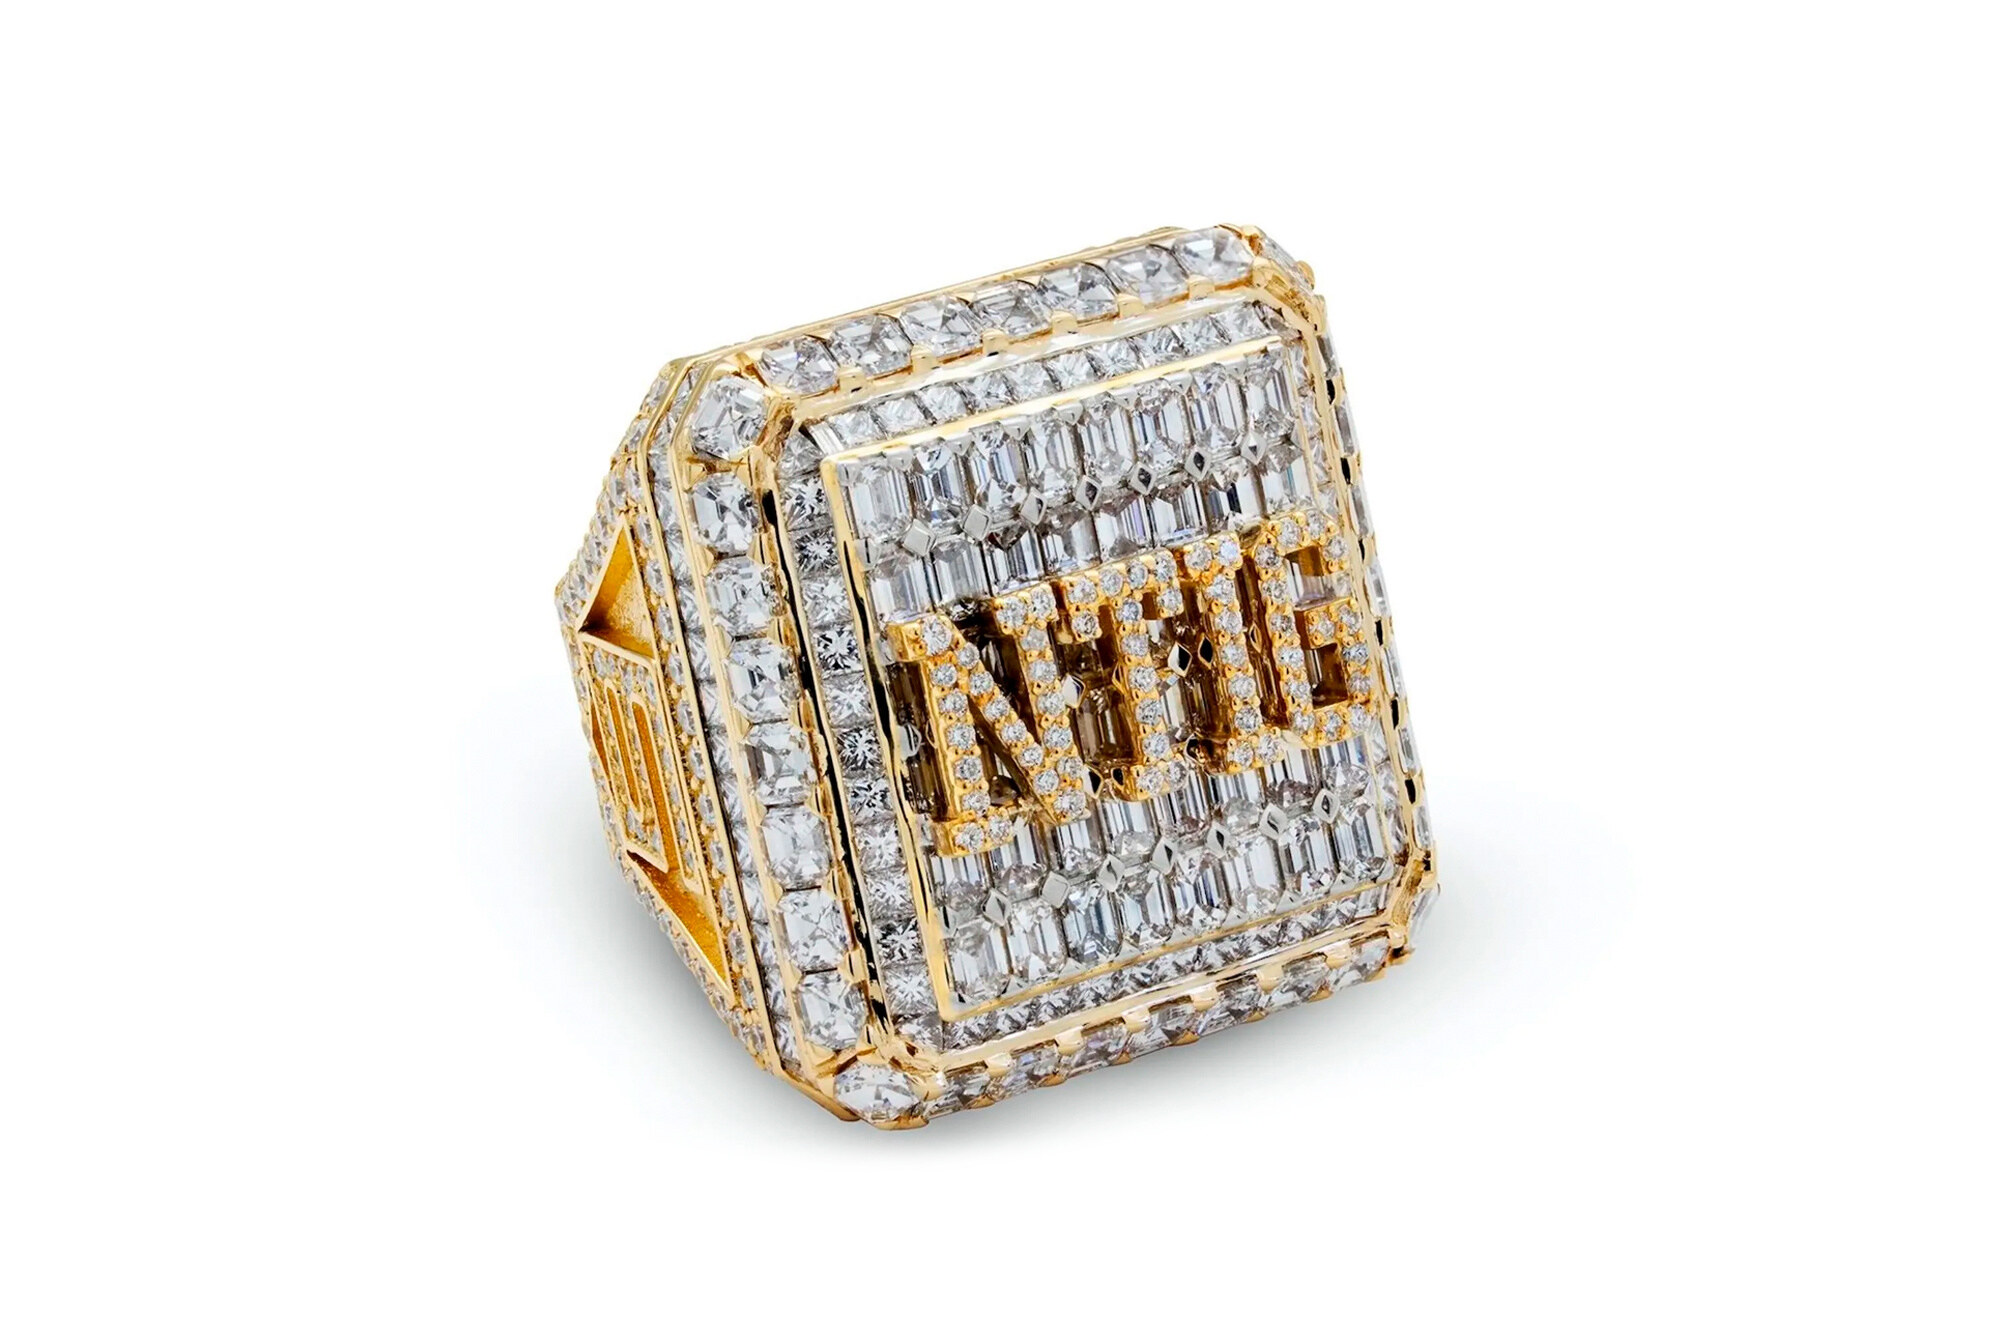 Drake anelli celebrativi da 50000 dollari